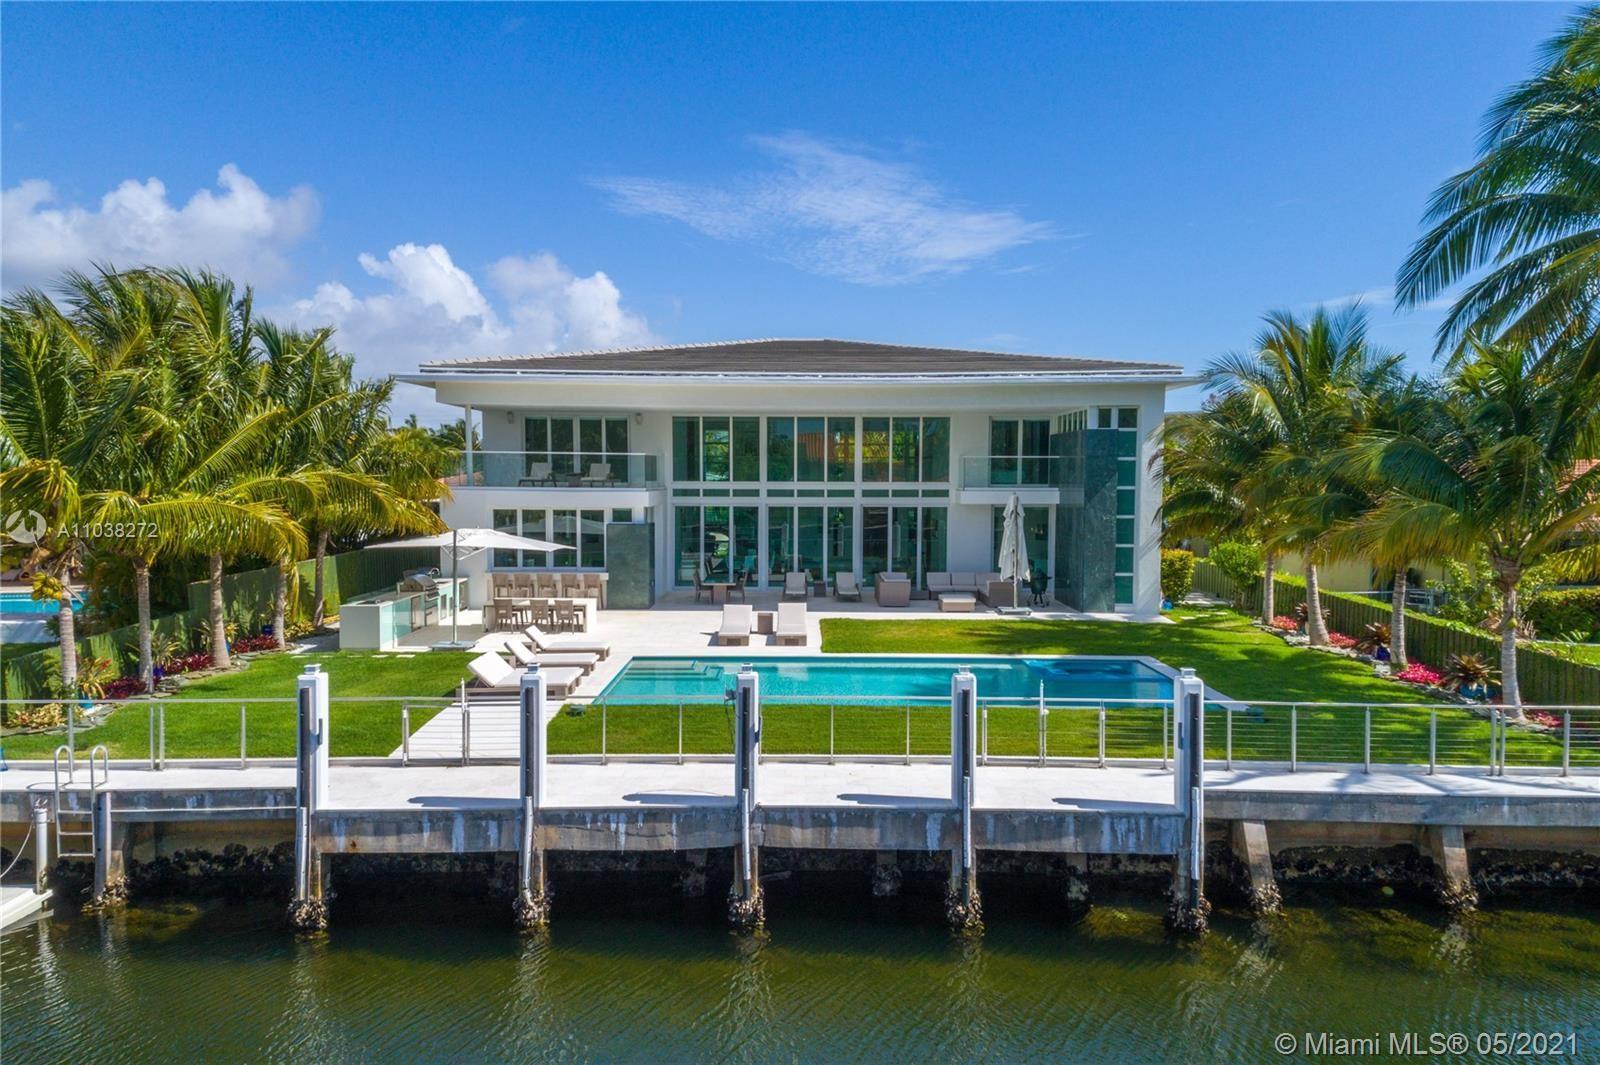 Photo of 431 Alamanda Dr, Hallandale Beach, FL 33009 (MLS # A11038272)